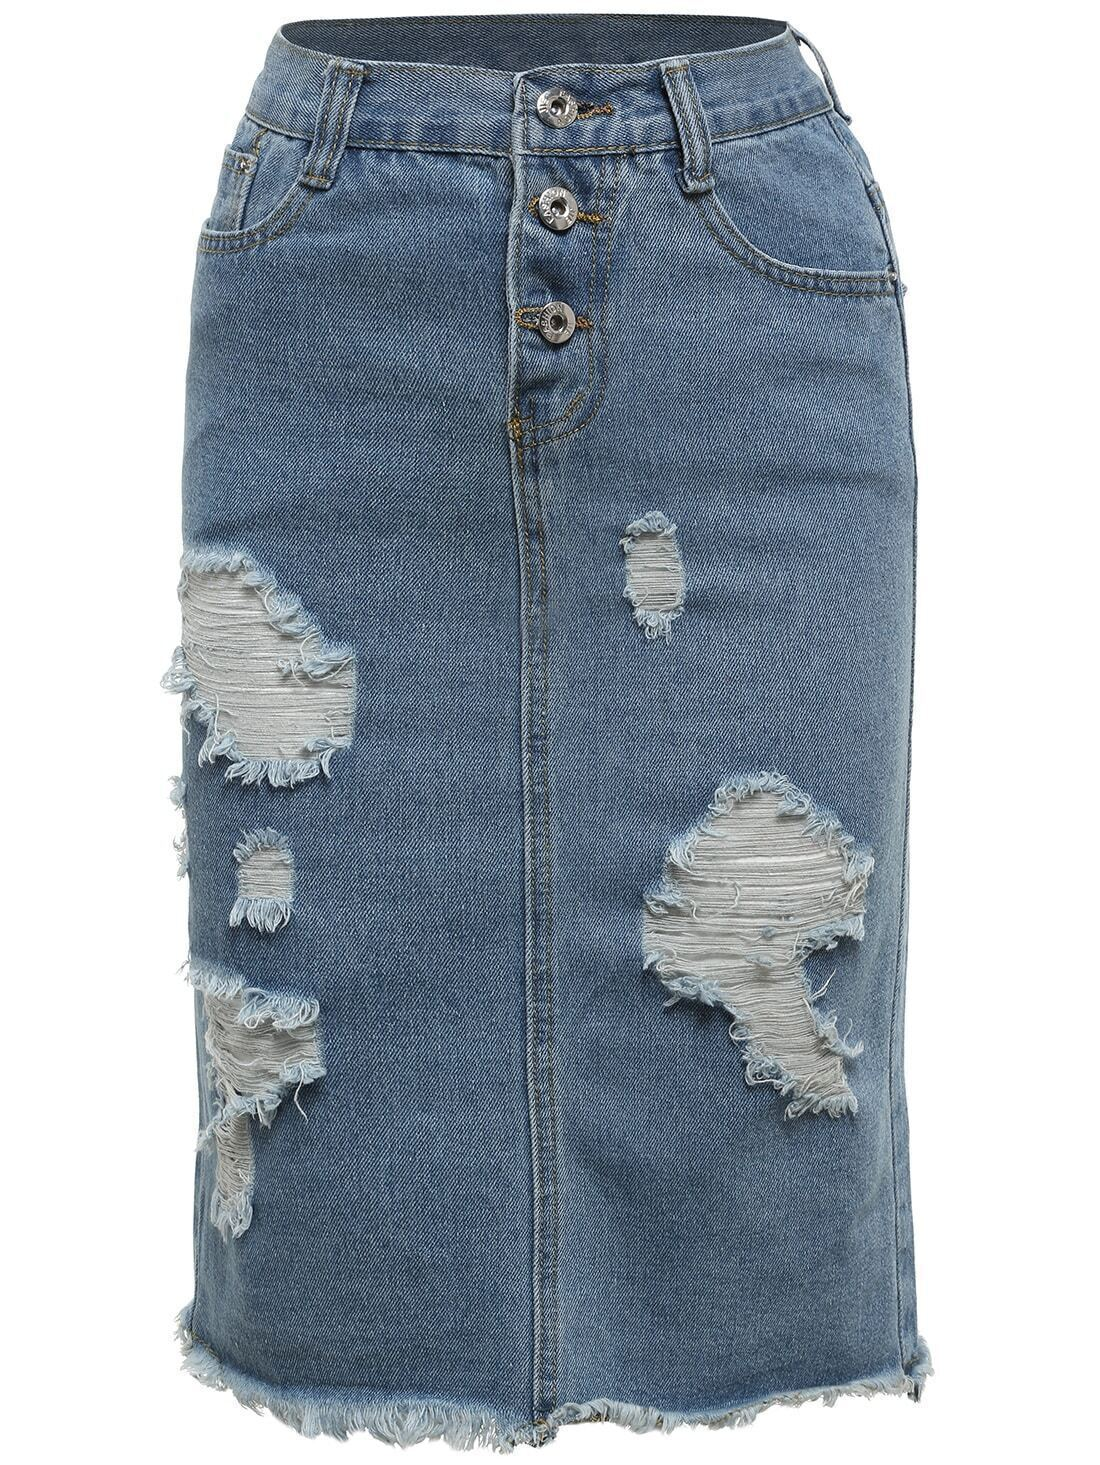 blue ripped frayed denim skirt